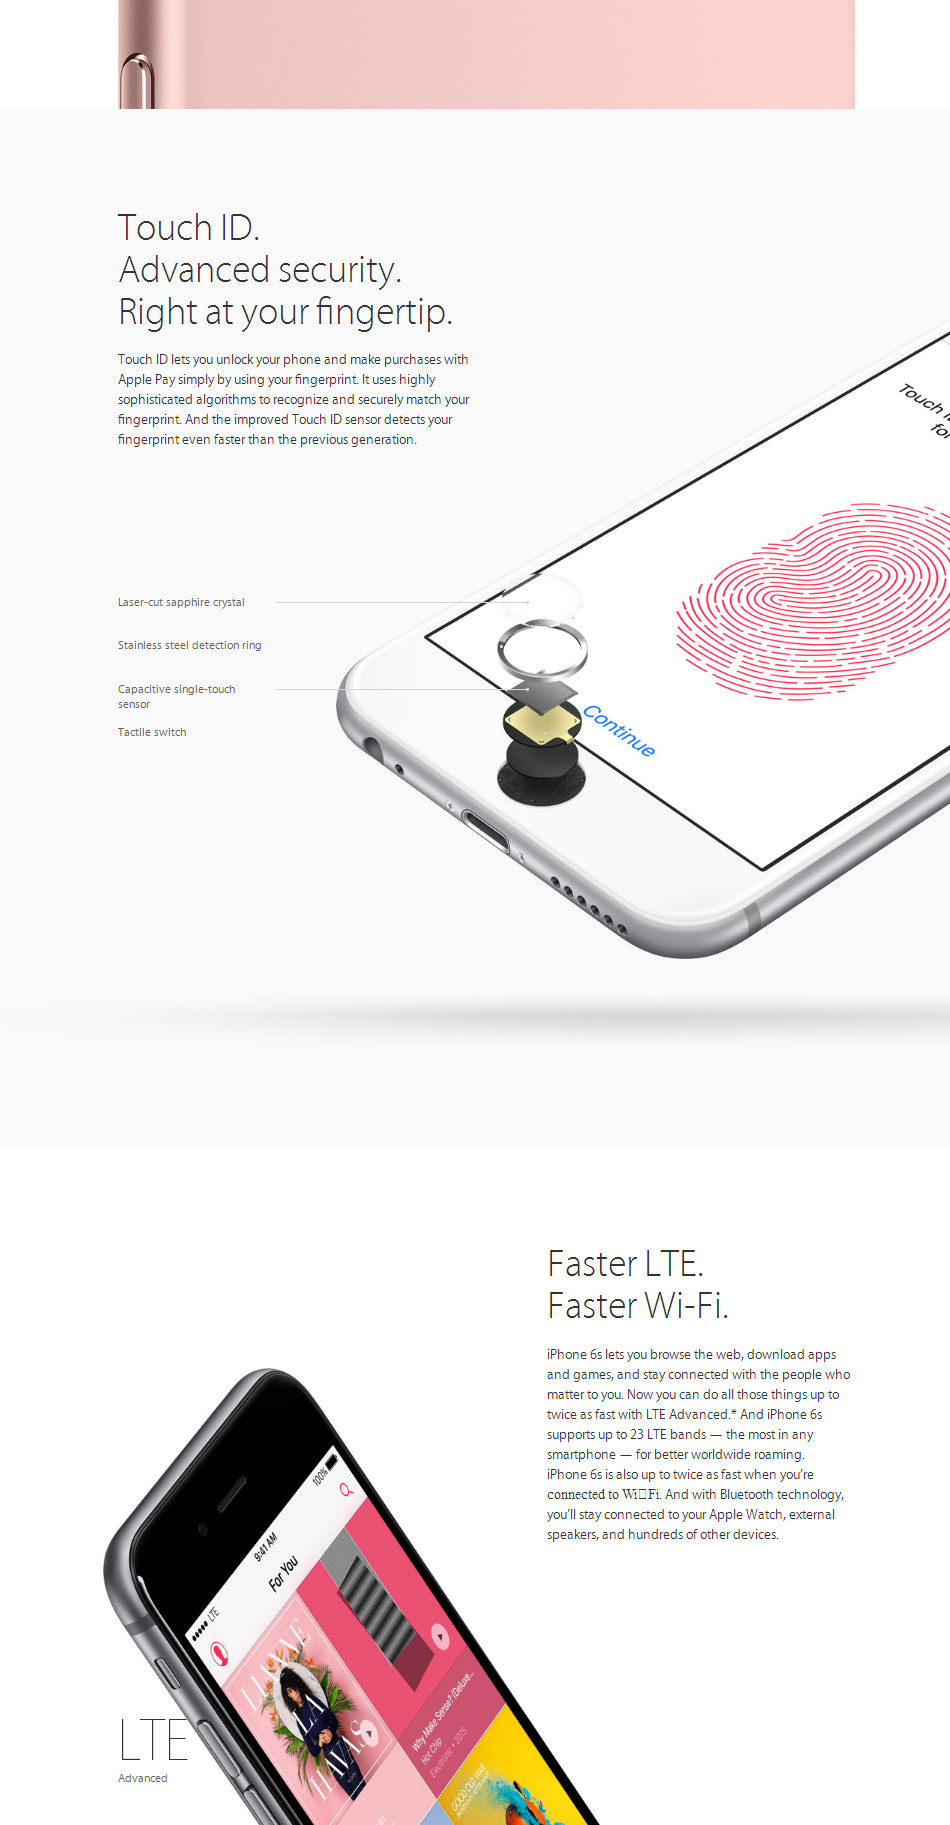 iPhone-6s_12